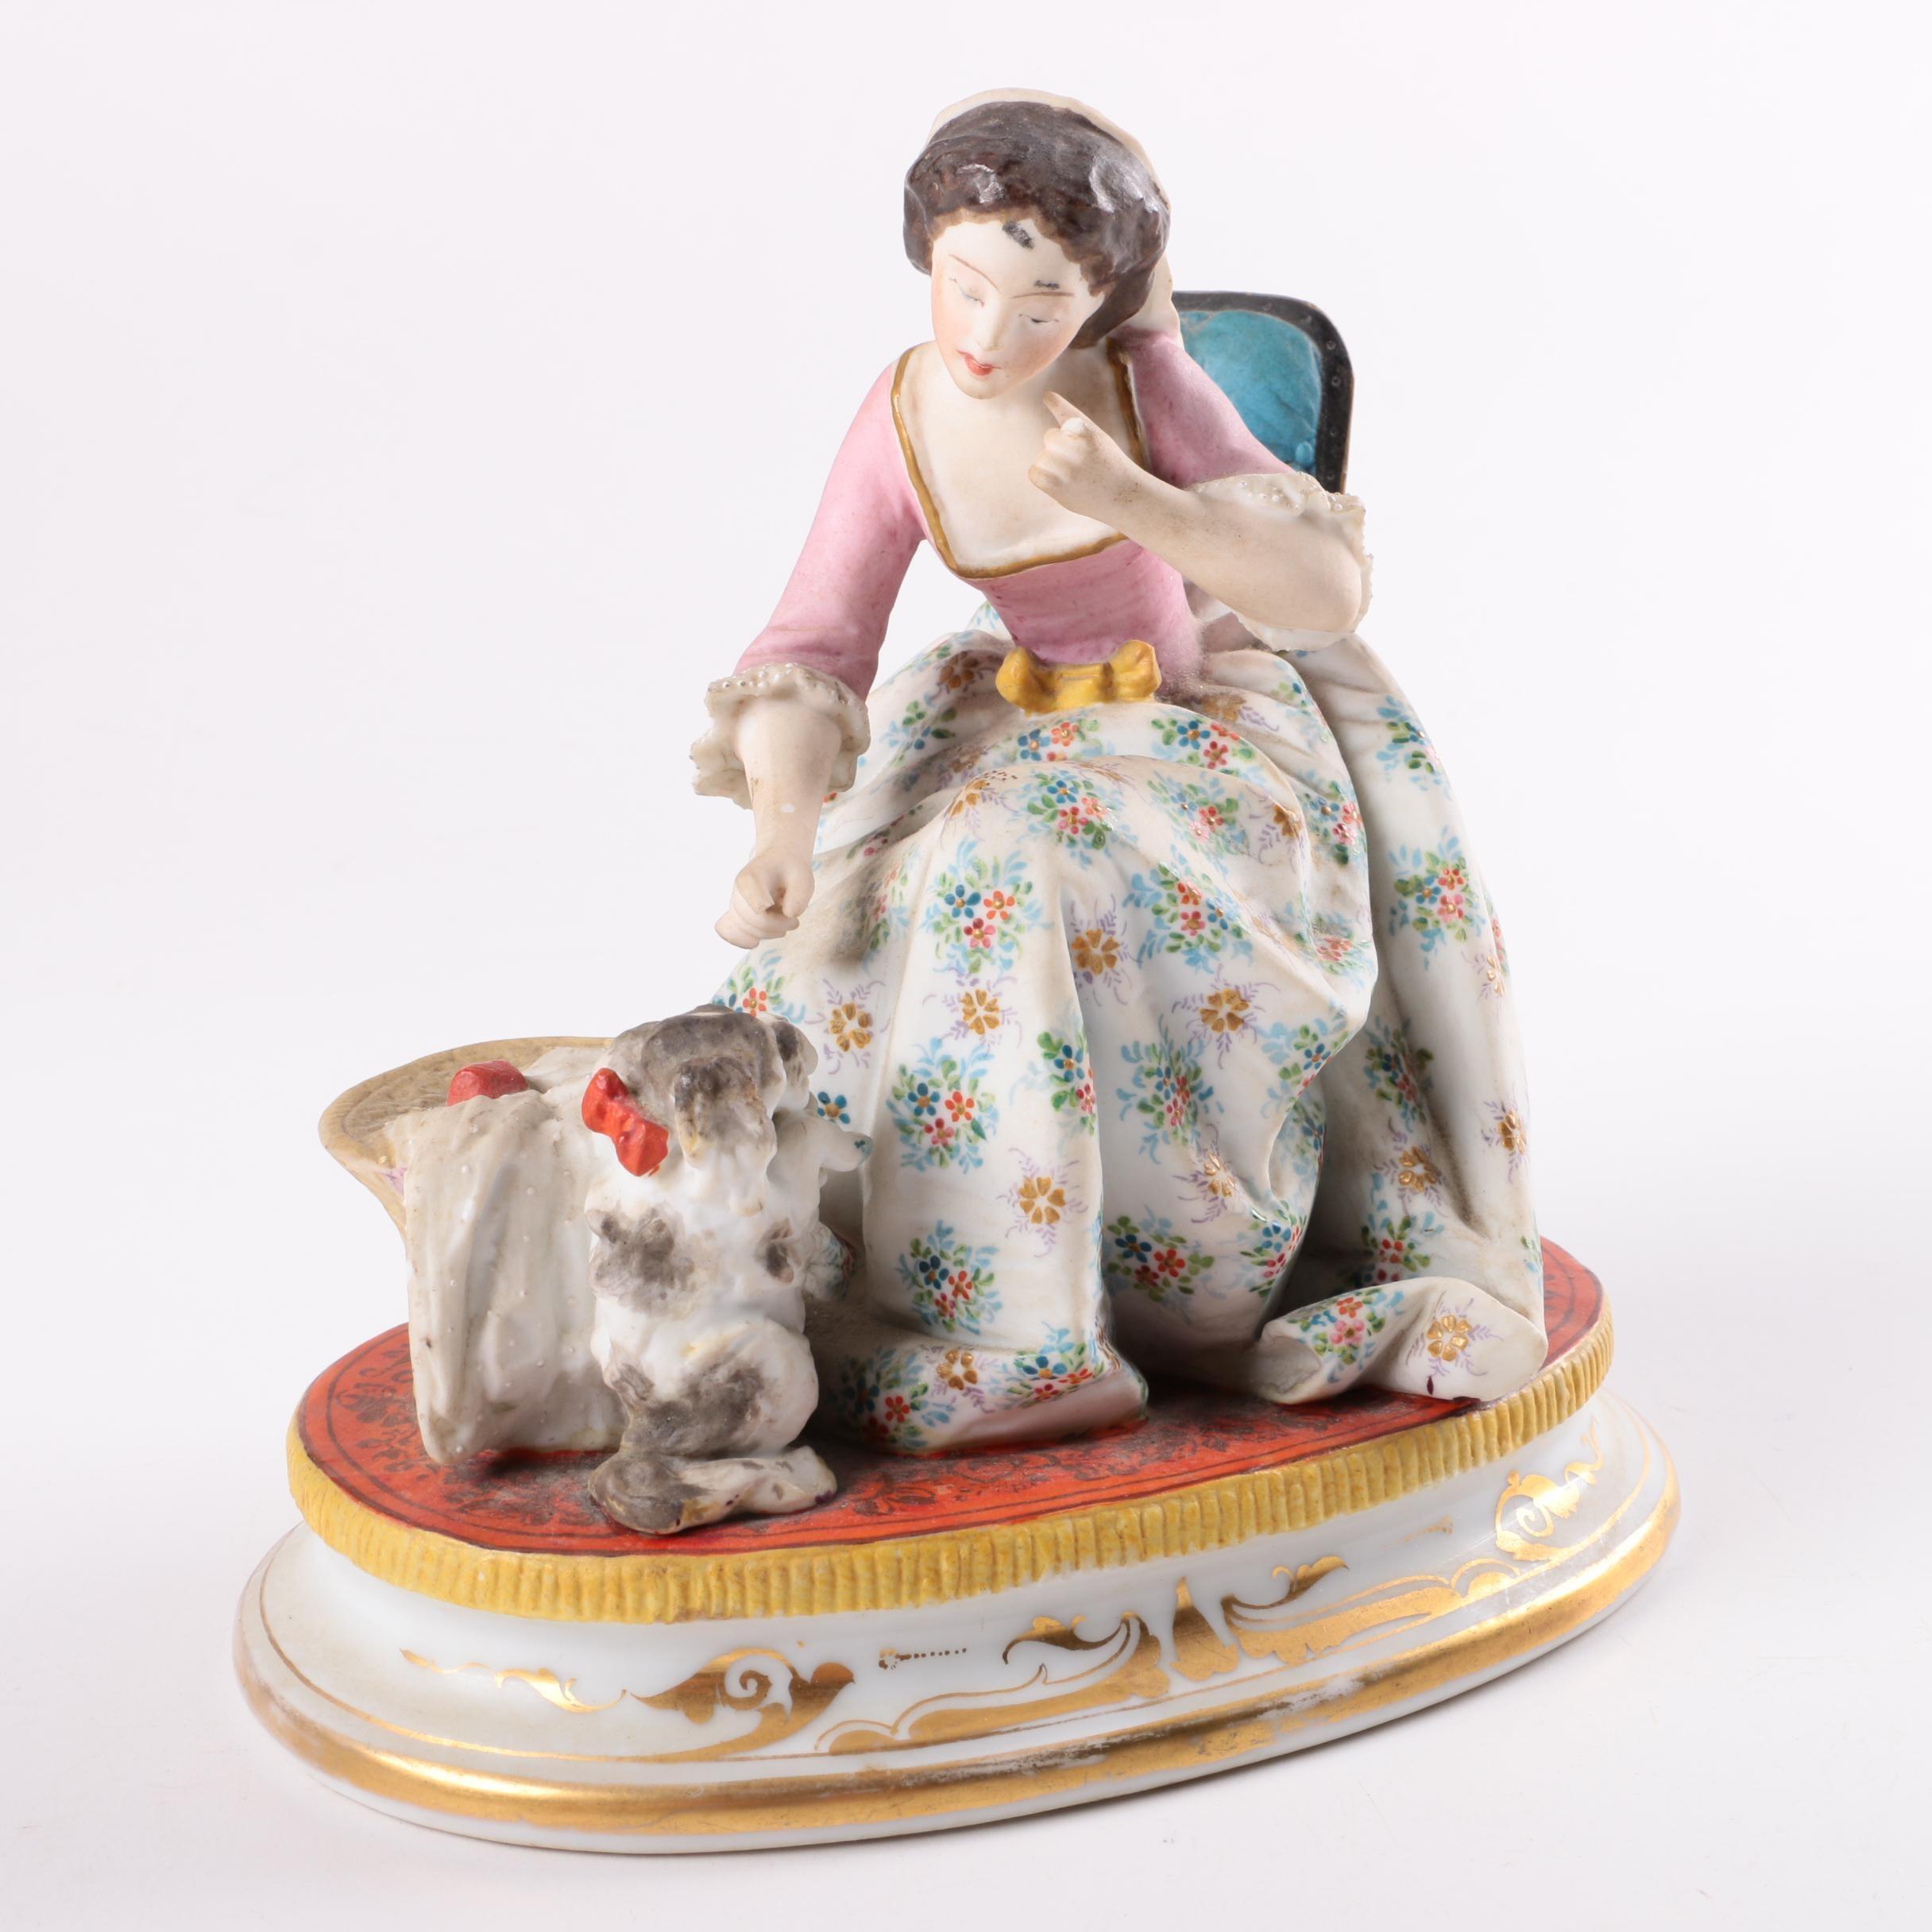 Antique Porcelain Figurine